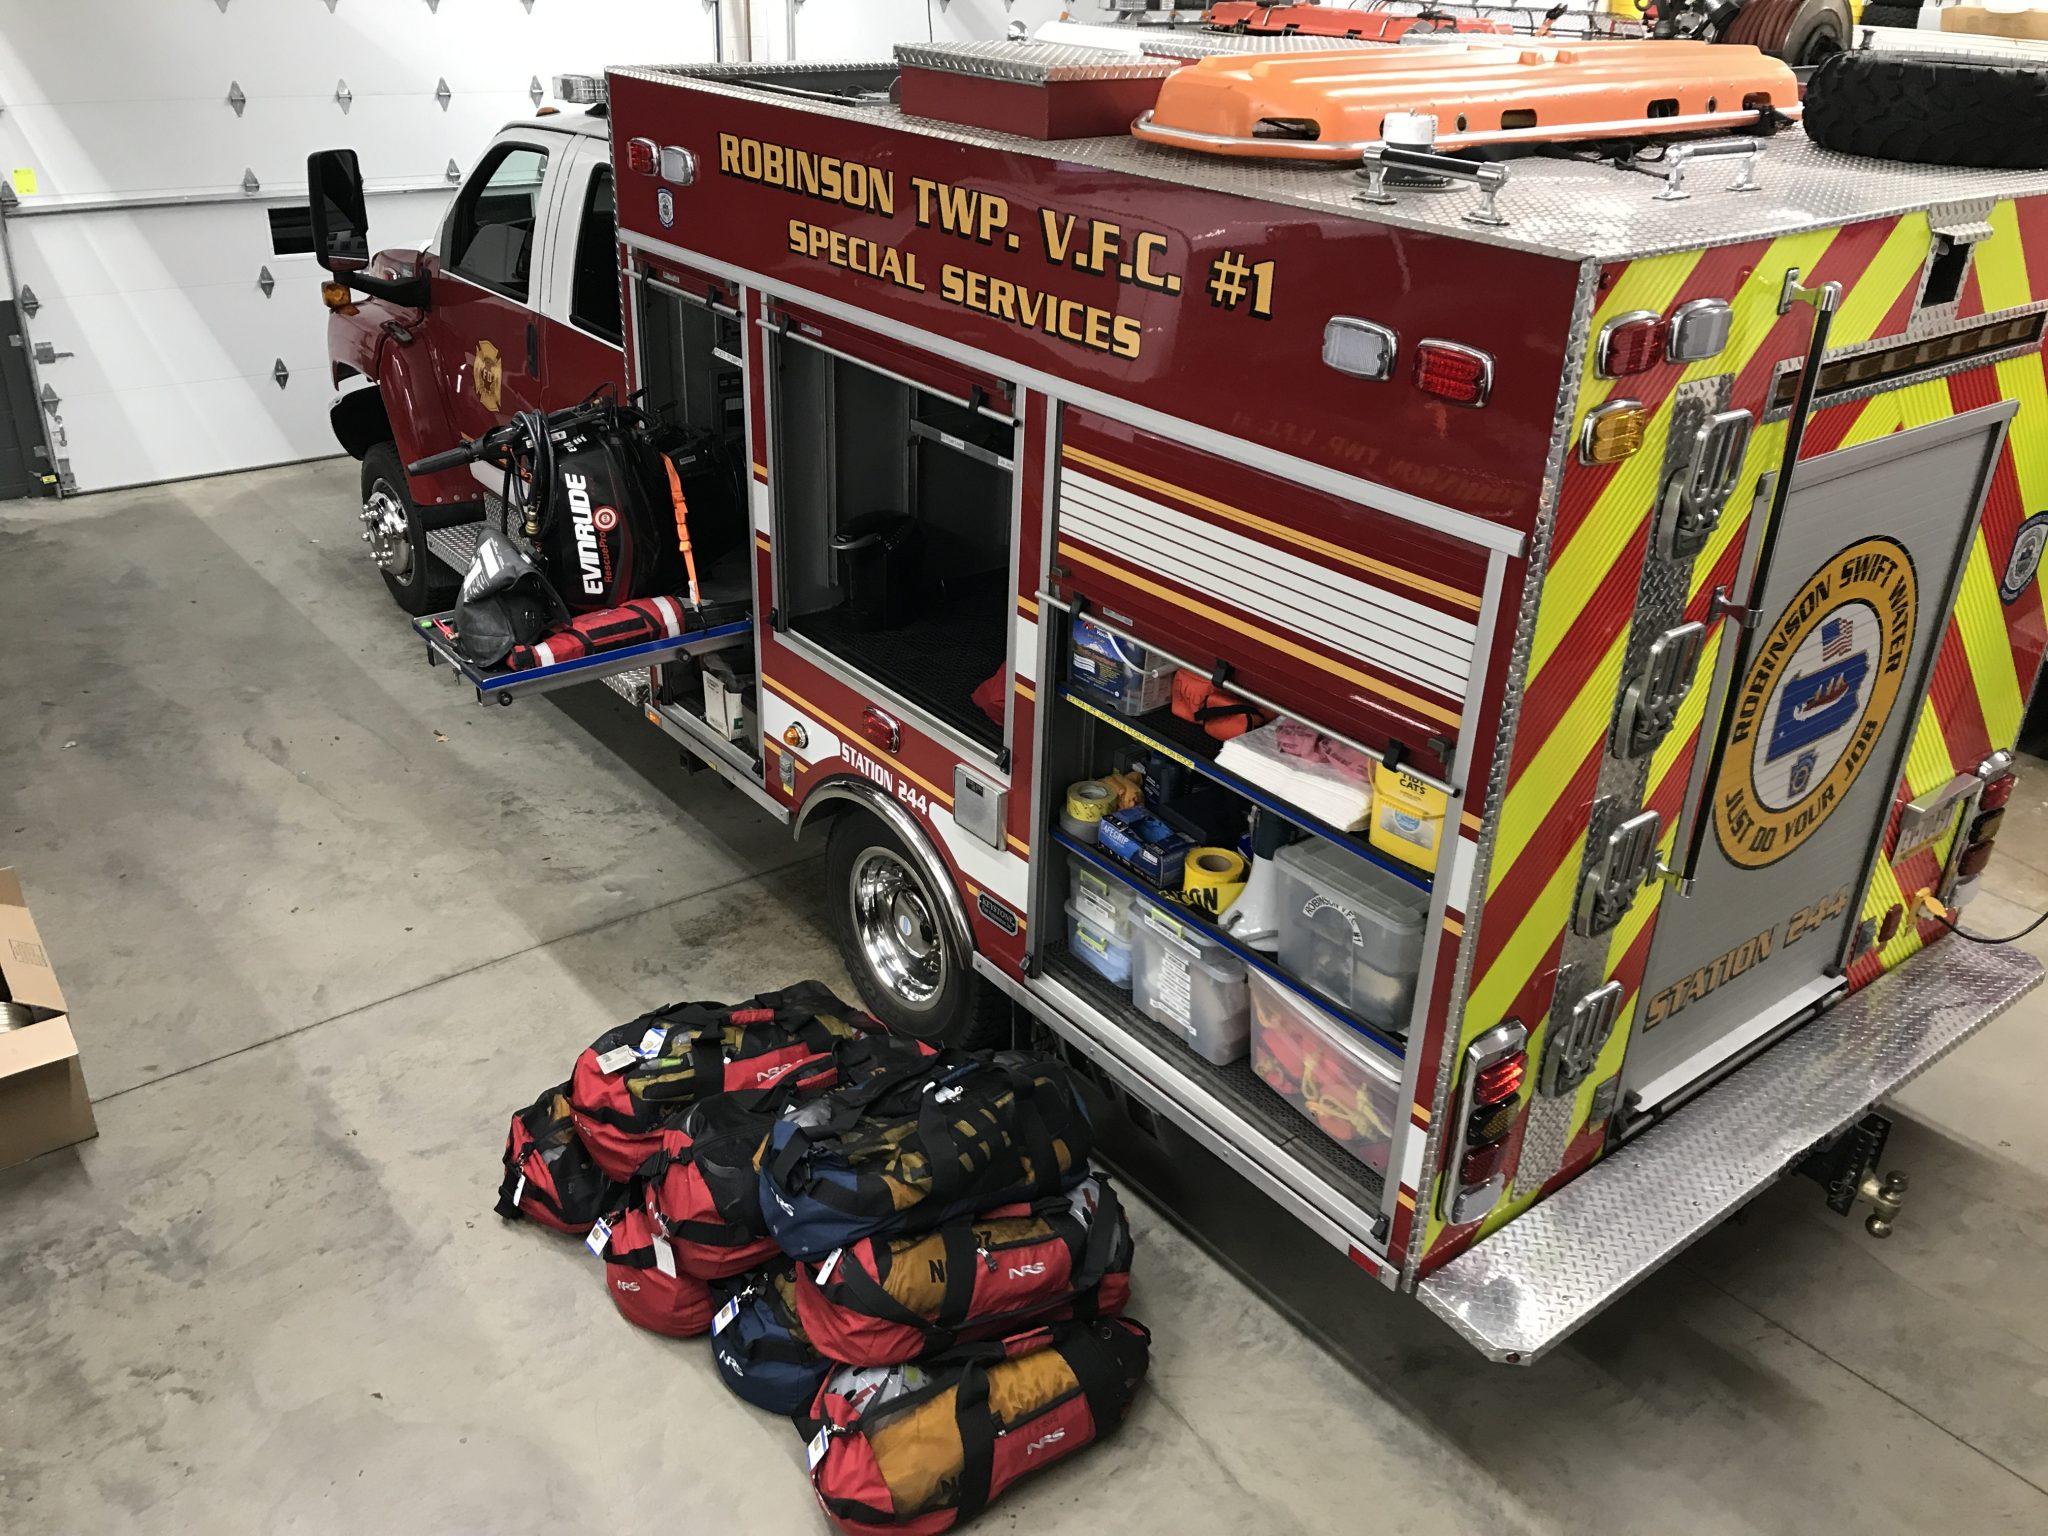 244 Apparatus • Robinson Township Volunteer Fire Company